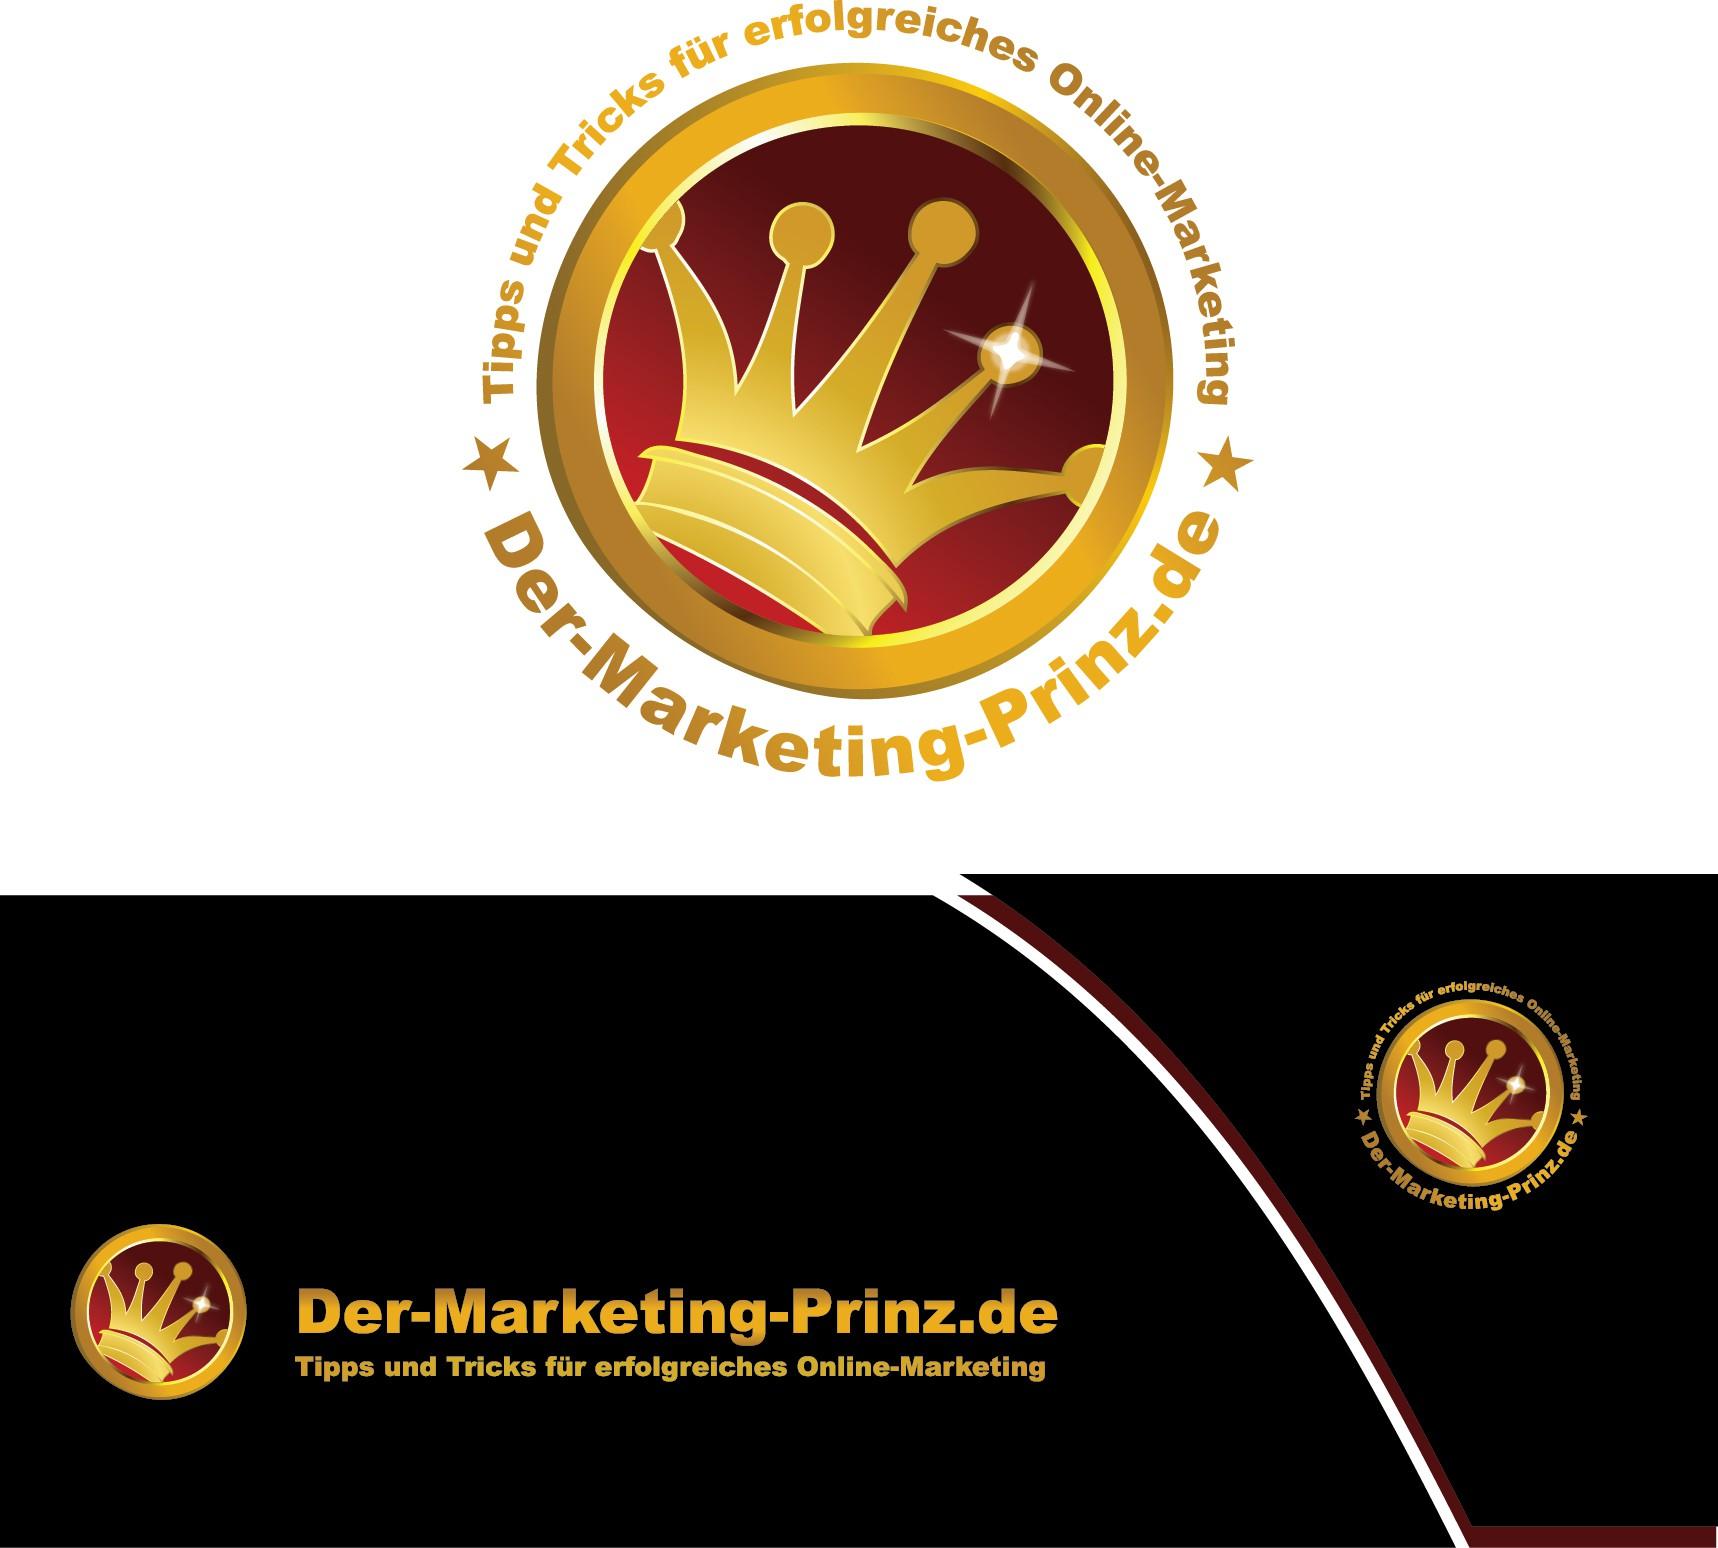 Der-Marketing-Prinz.de benötigt Logo